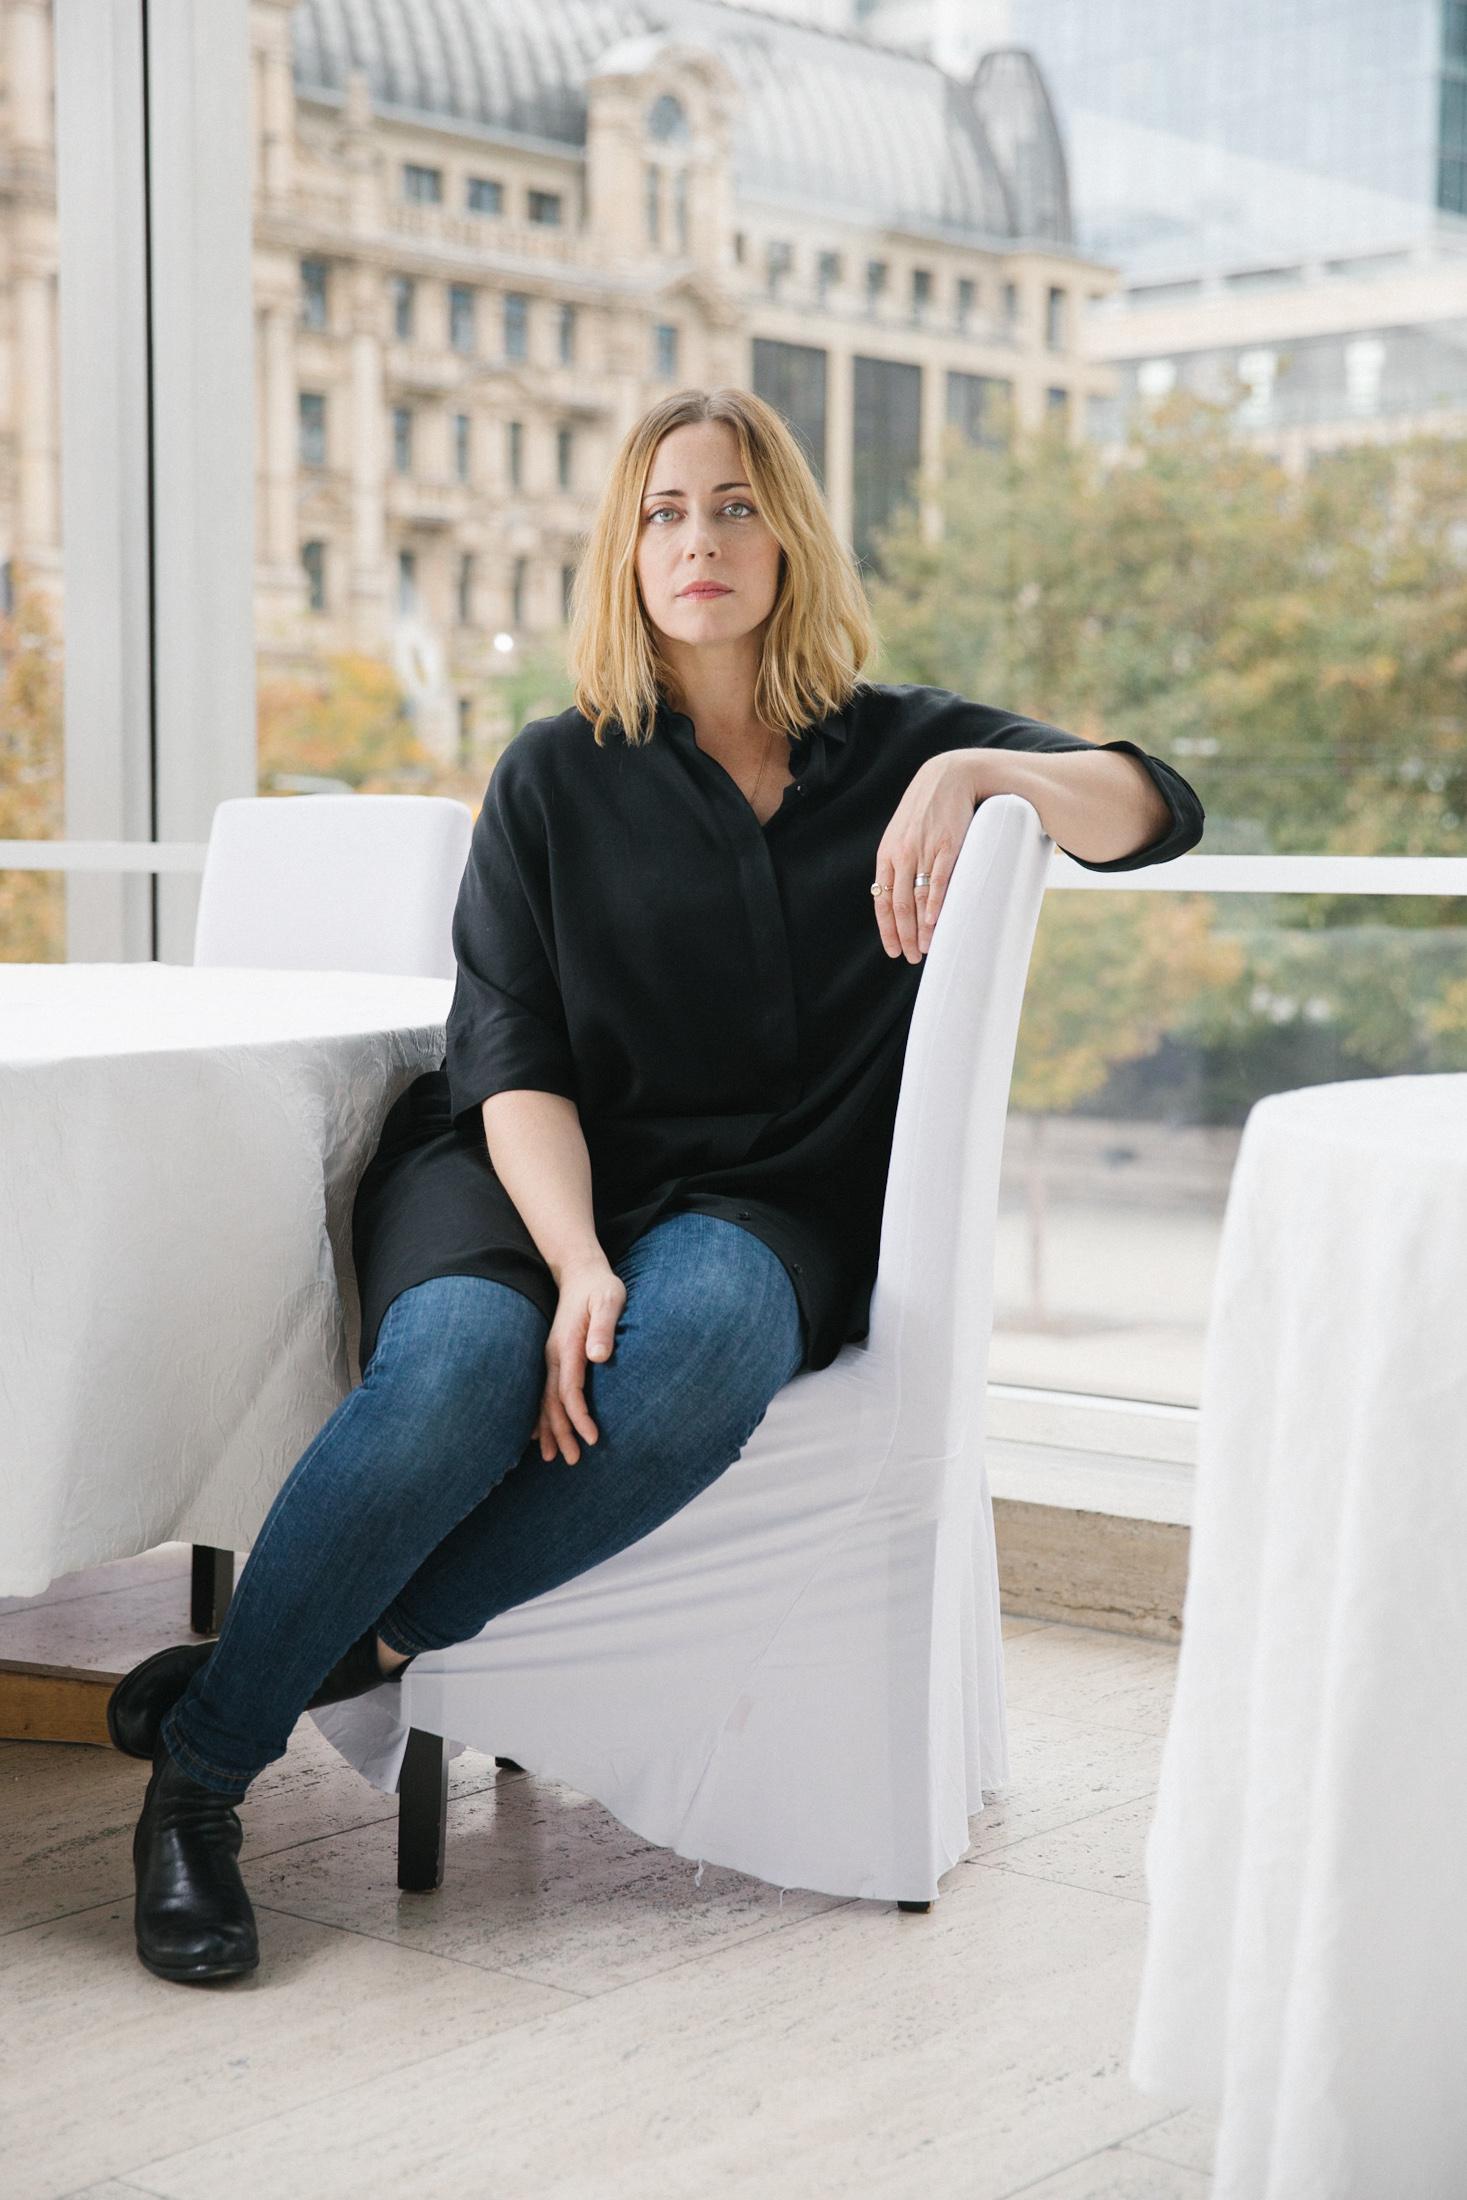 Lydia Steier for FORBES Opera Frankfurt am Main